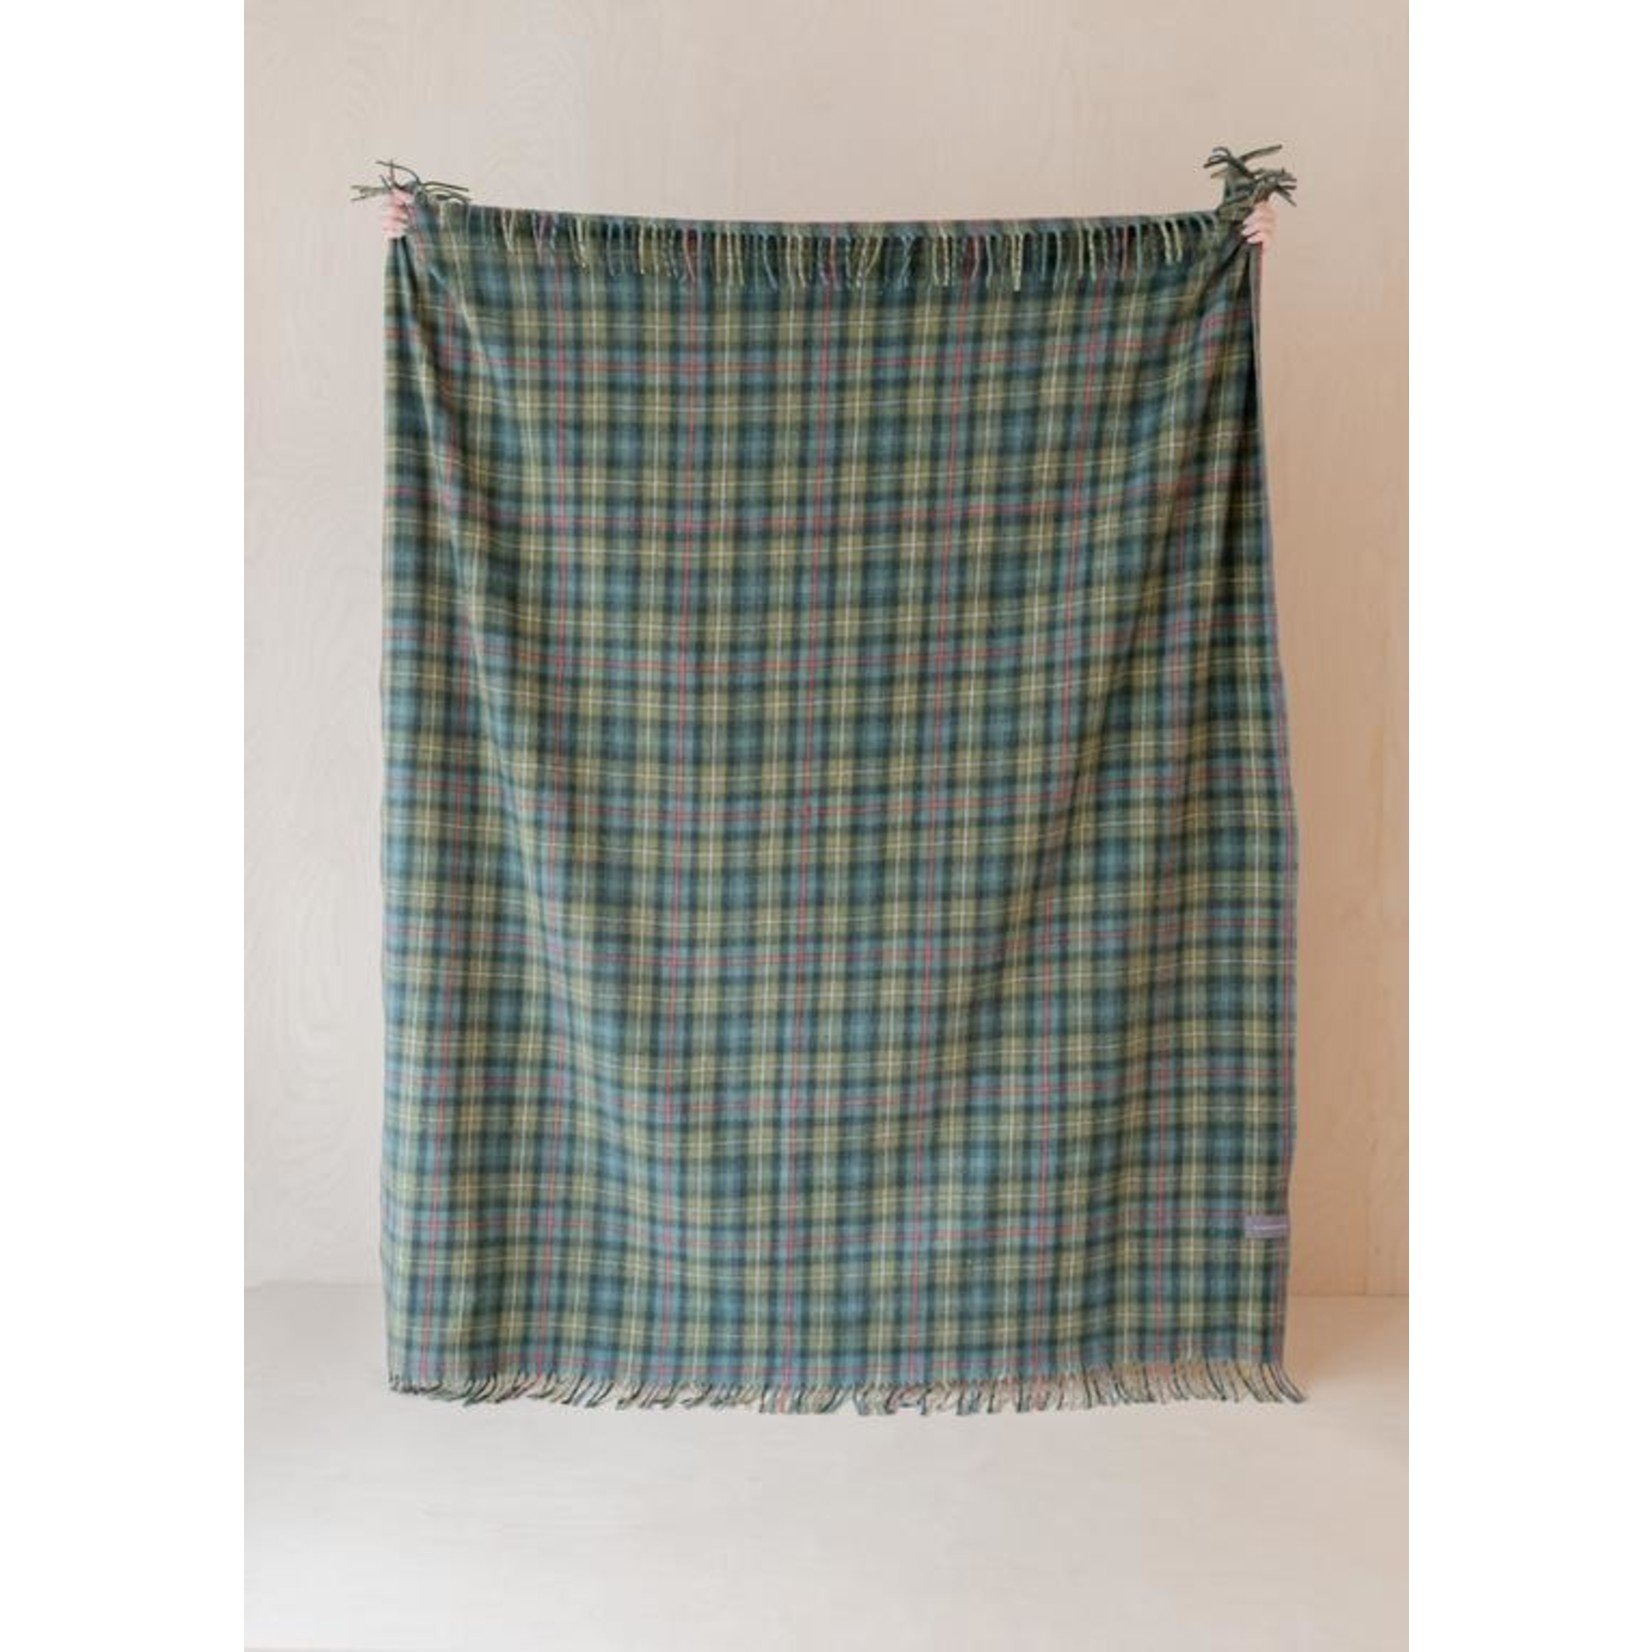 Aran Crafts Edinburgh 4812MAC Wool Throw - MacKenzie